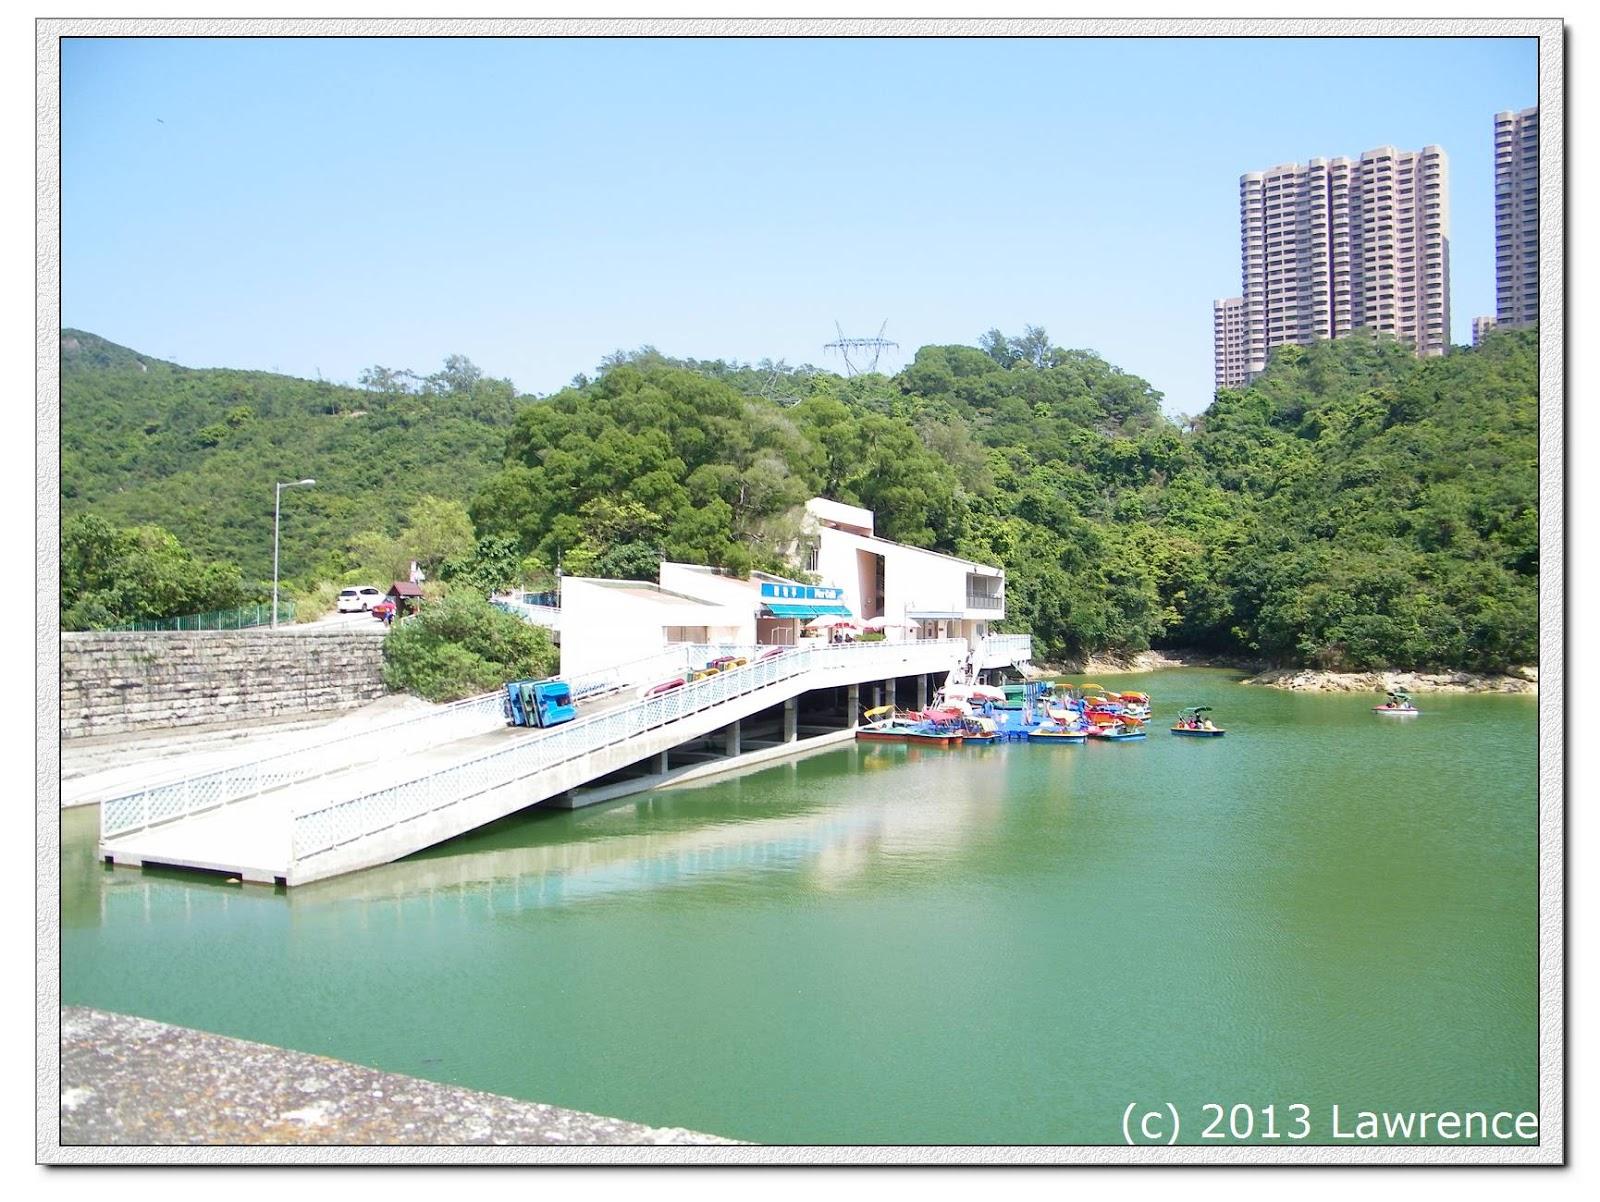 Lawrence的遠足遊蹤: 黃泥涌水塘(Wong Lai Chung Reservois)至赤柱峽道(Stanley Gap Road)